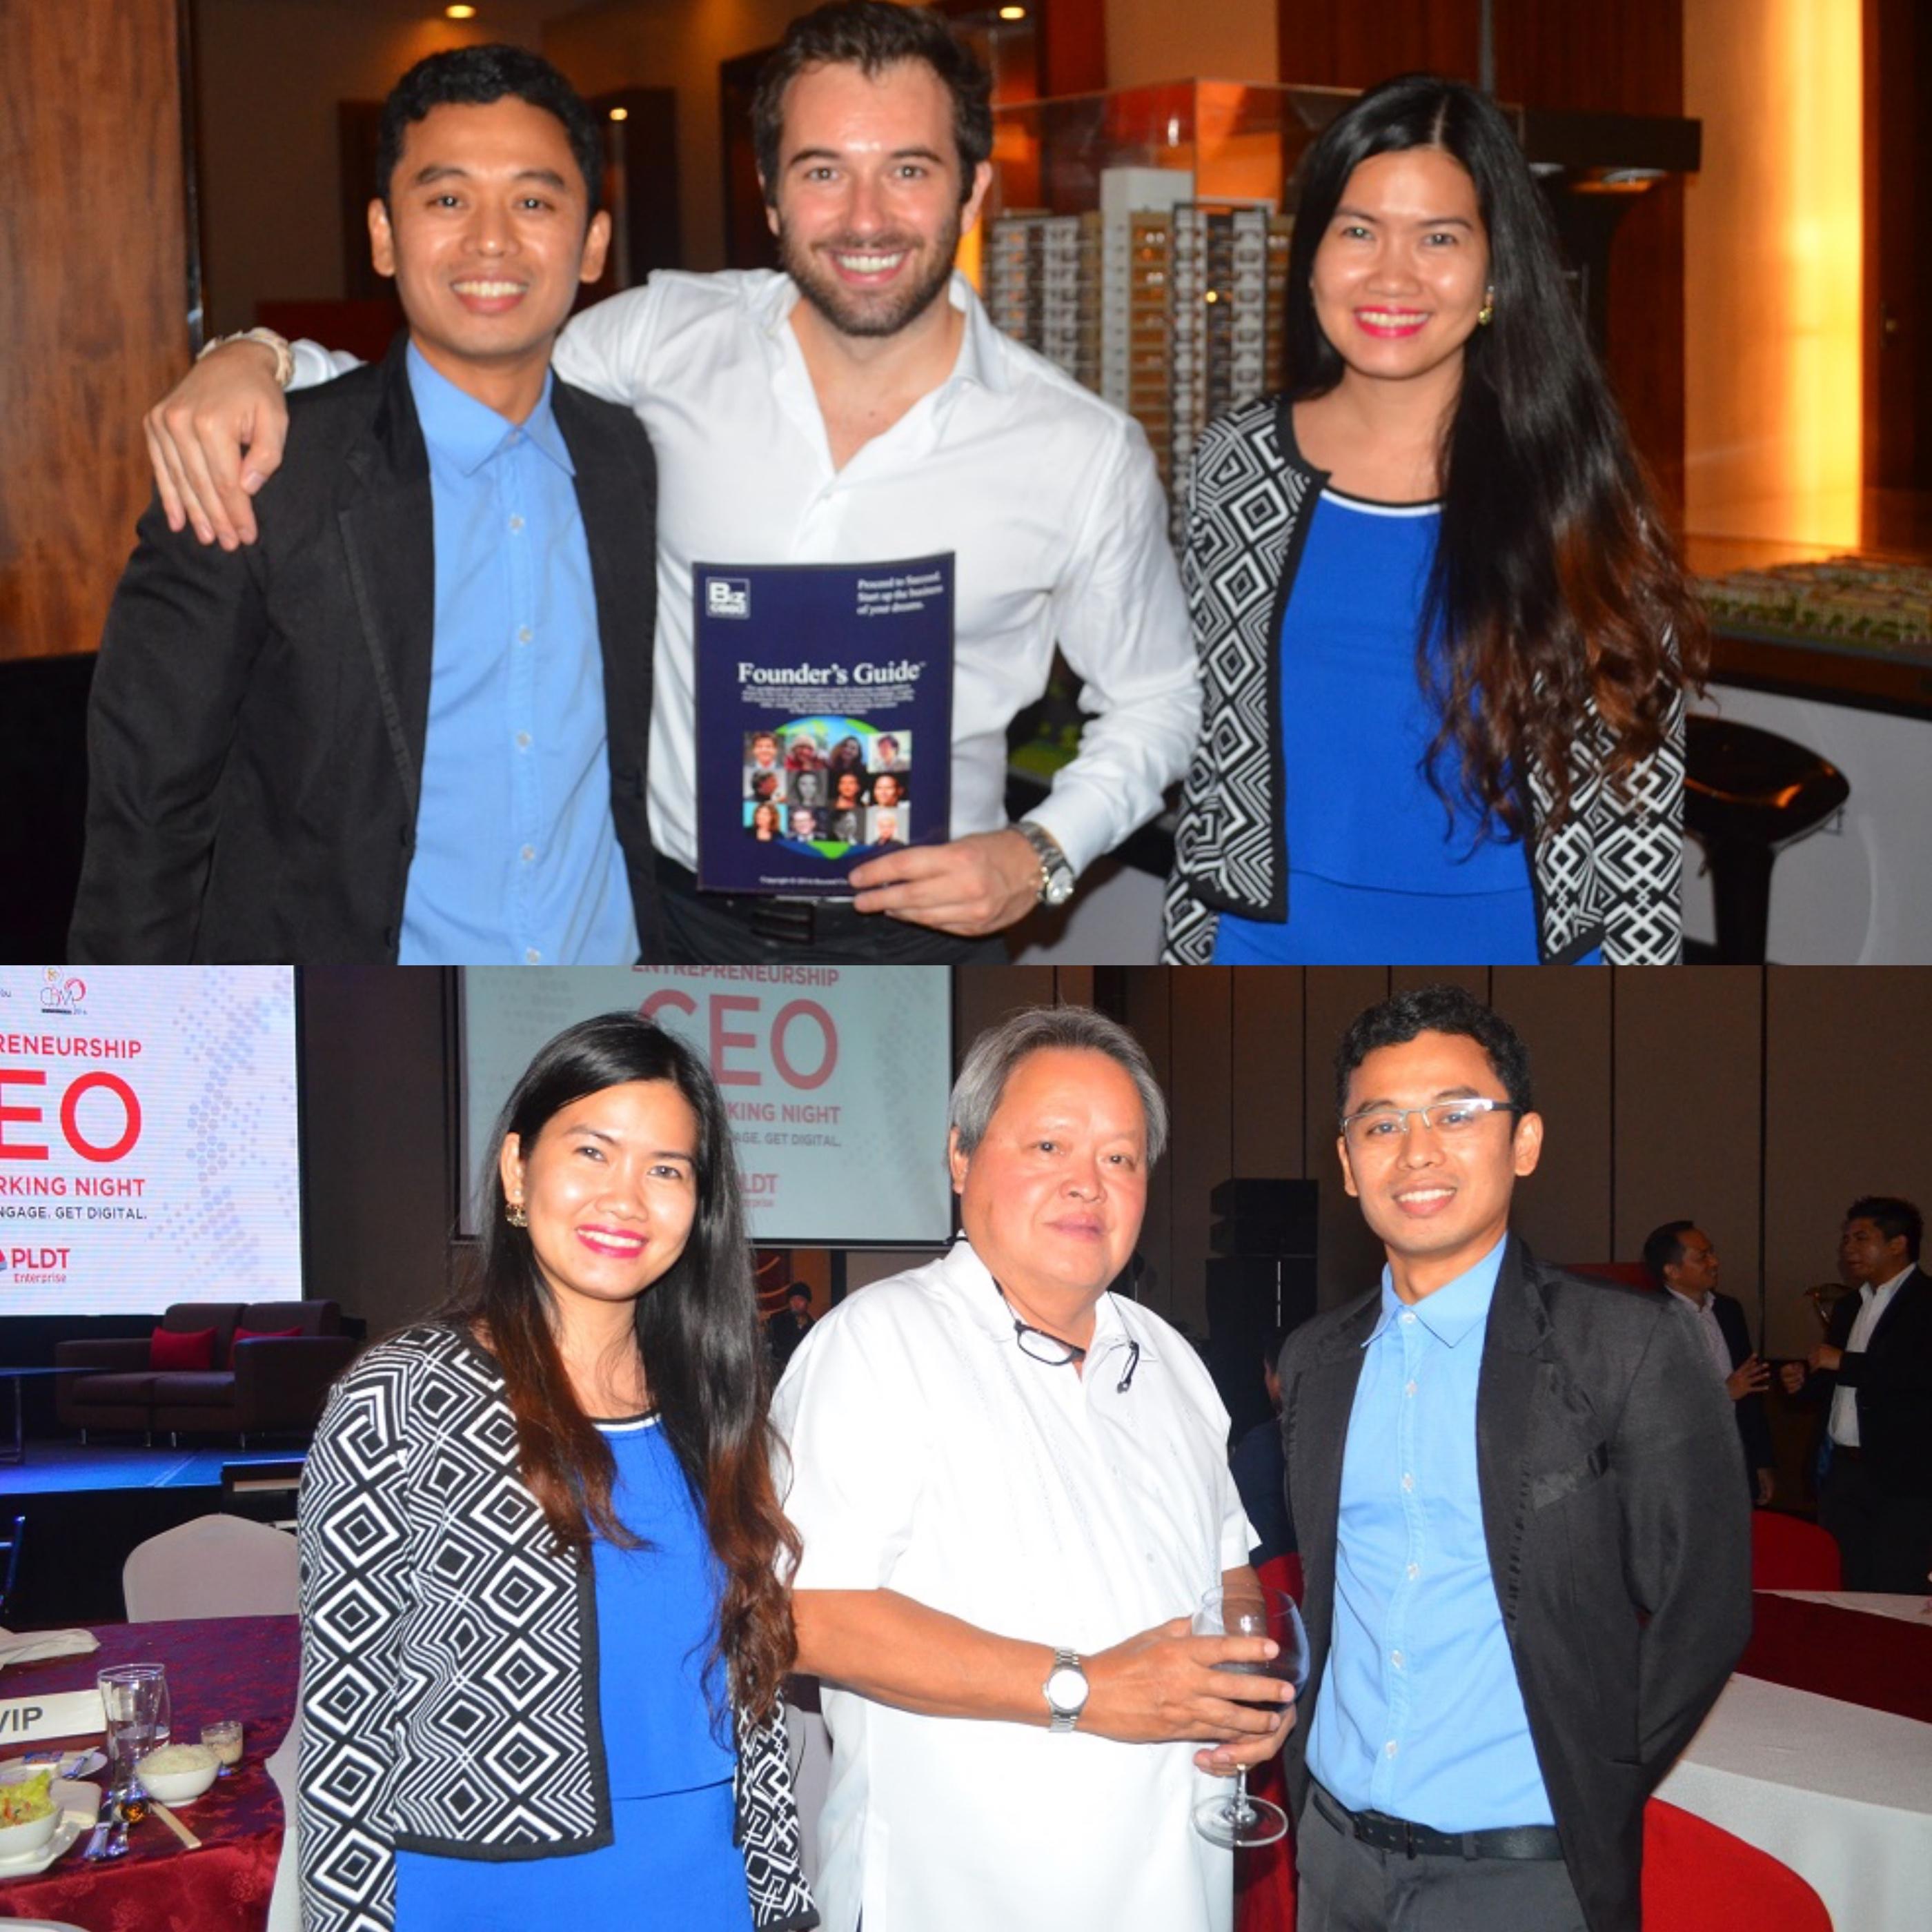 social entrepreneurship conference 2016 4